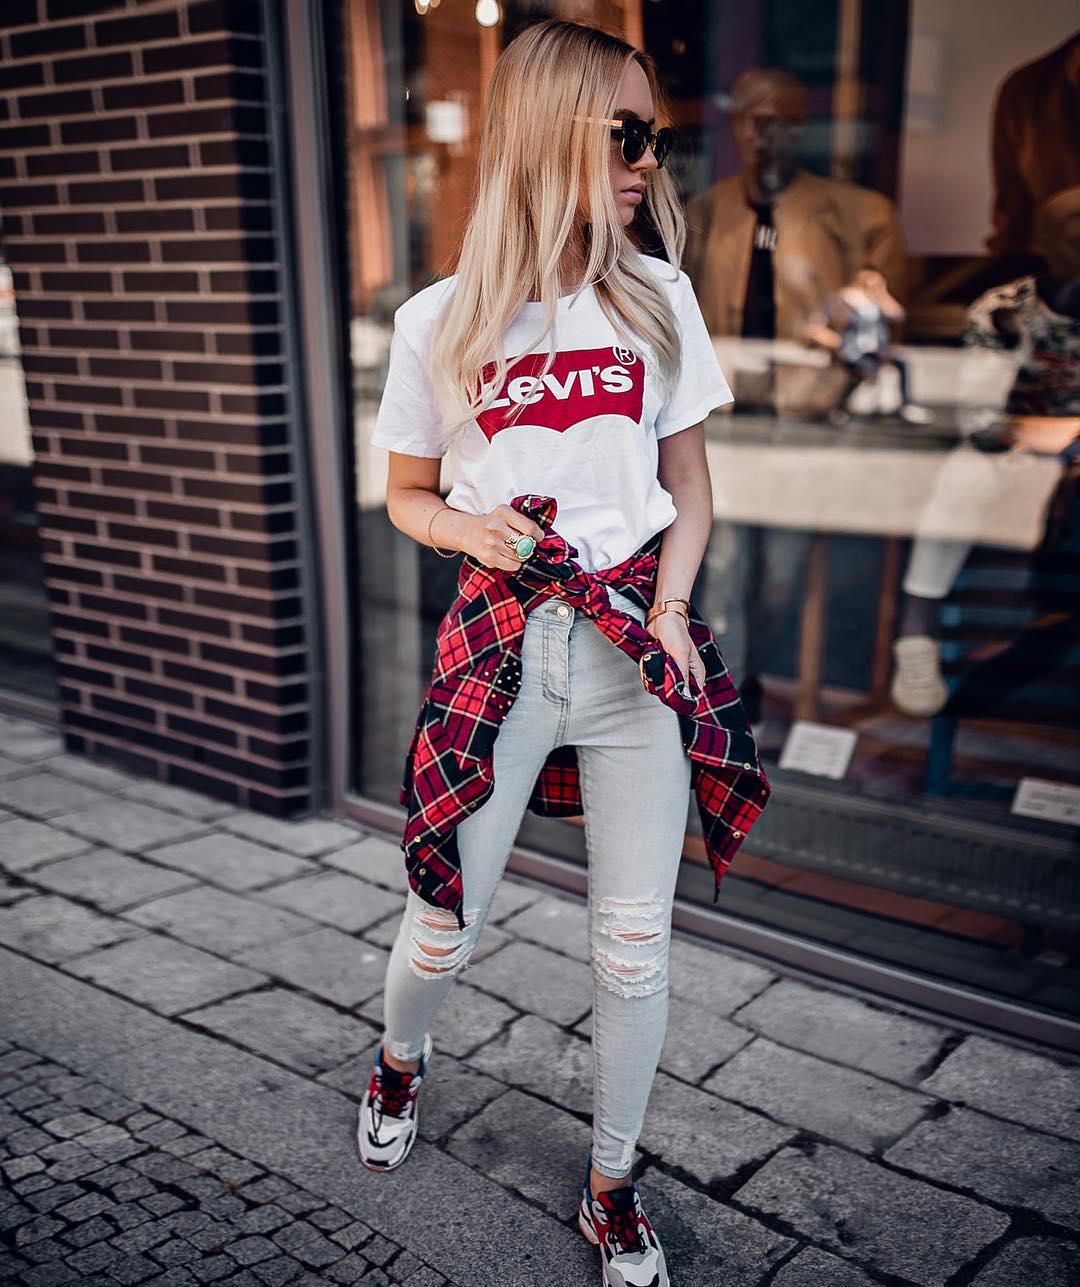 t-shirt levis blanc de Les Bourgeoises sur oksana_orehhova